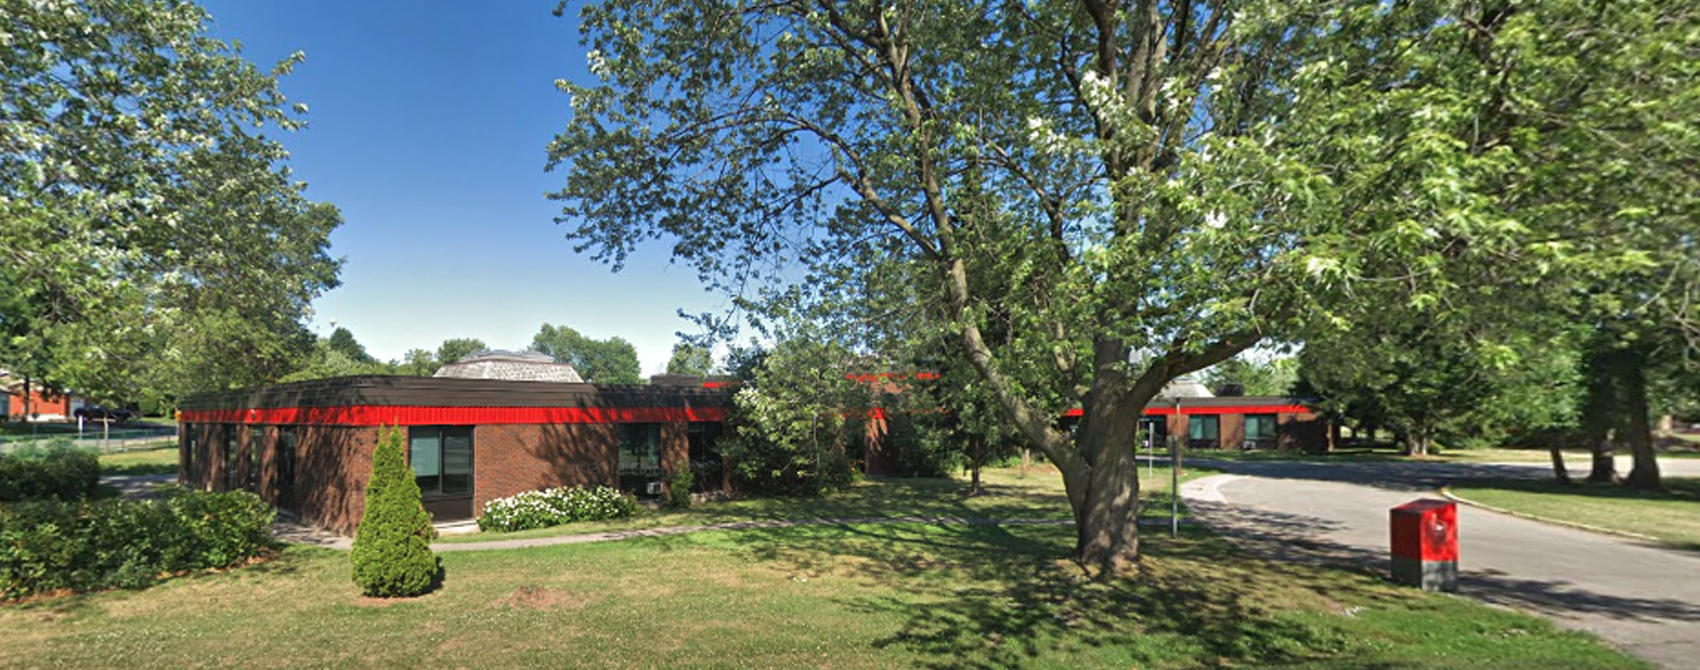 École Beacon Hill